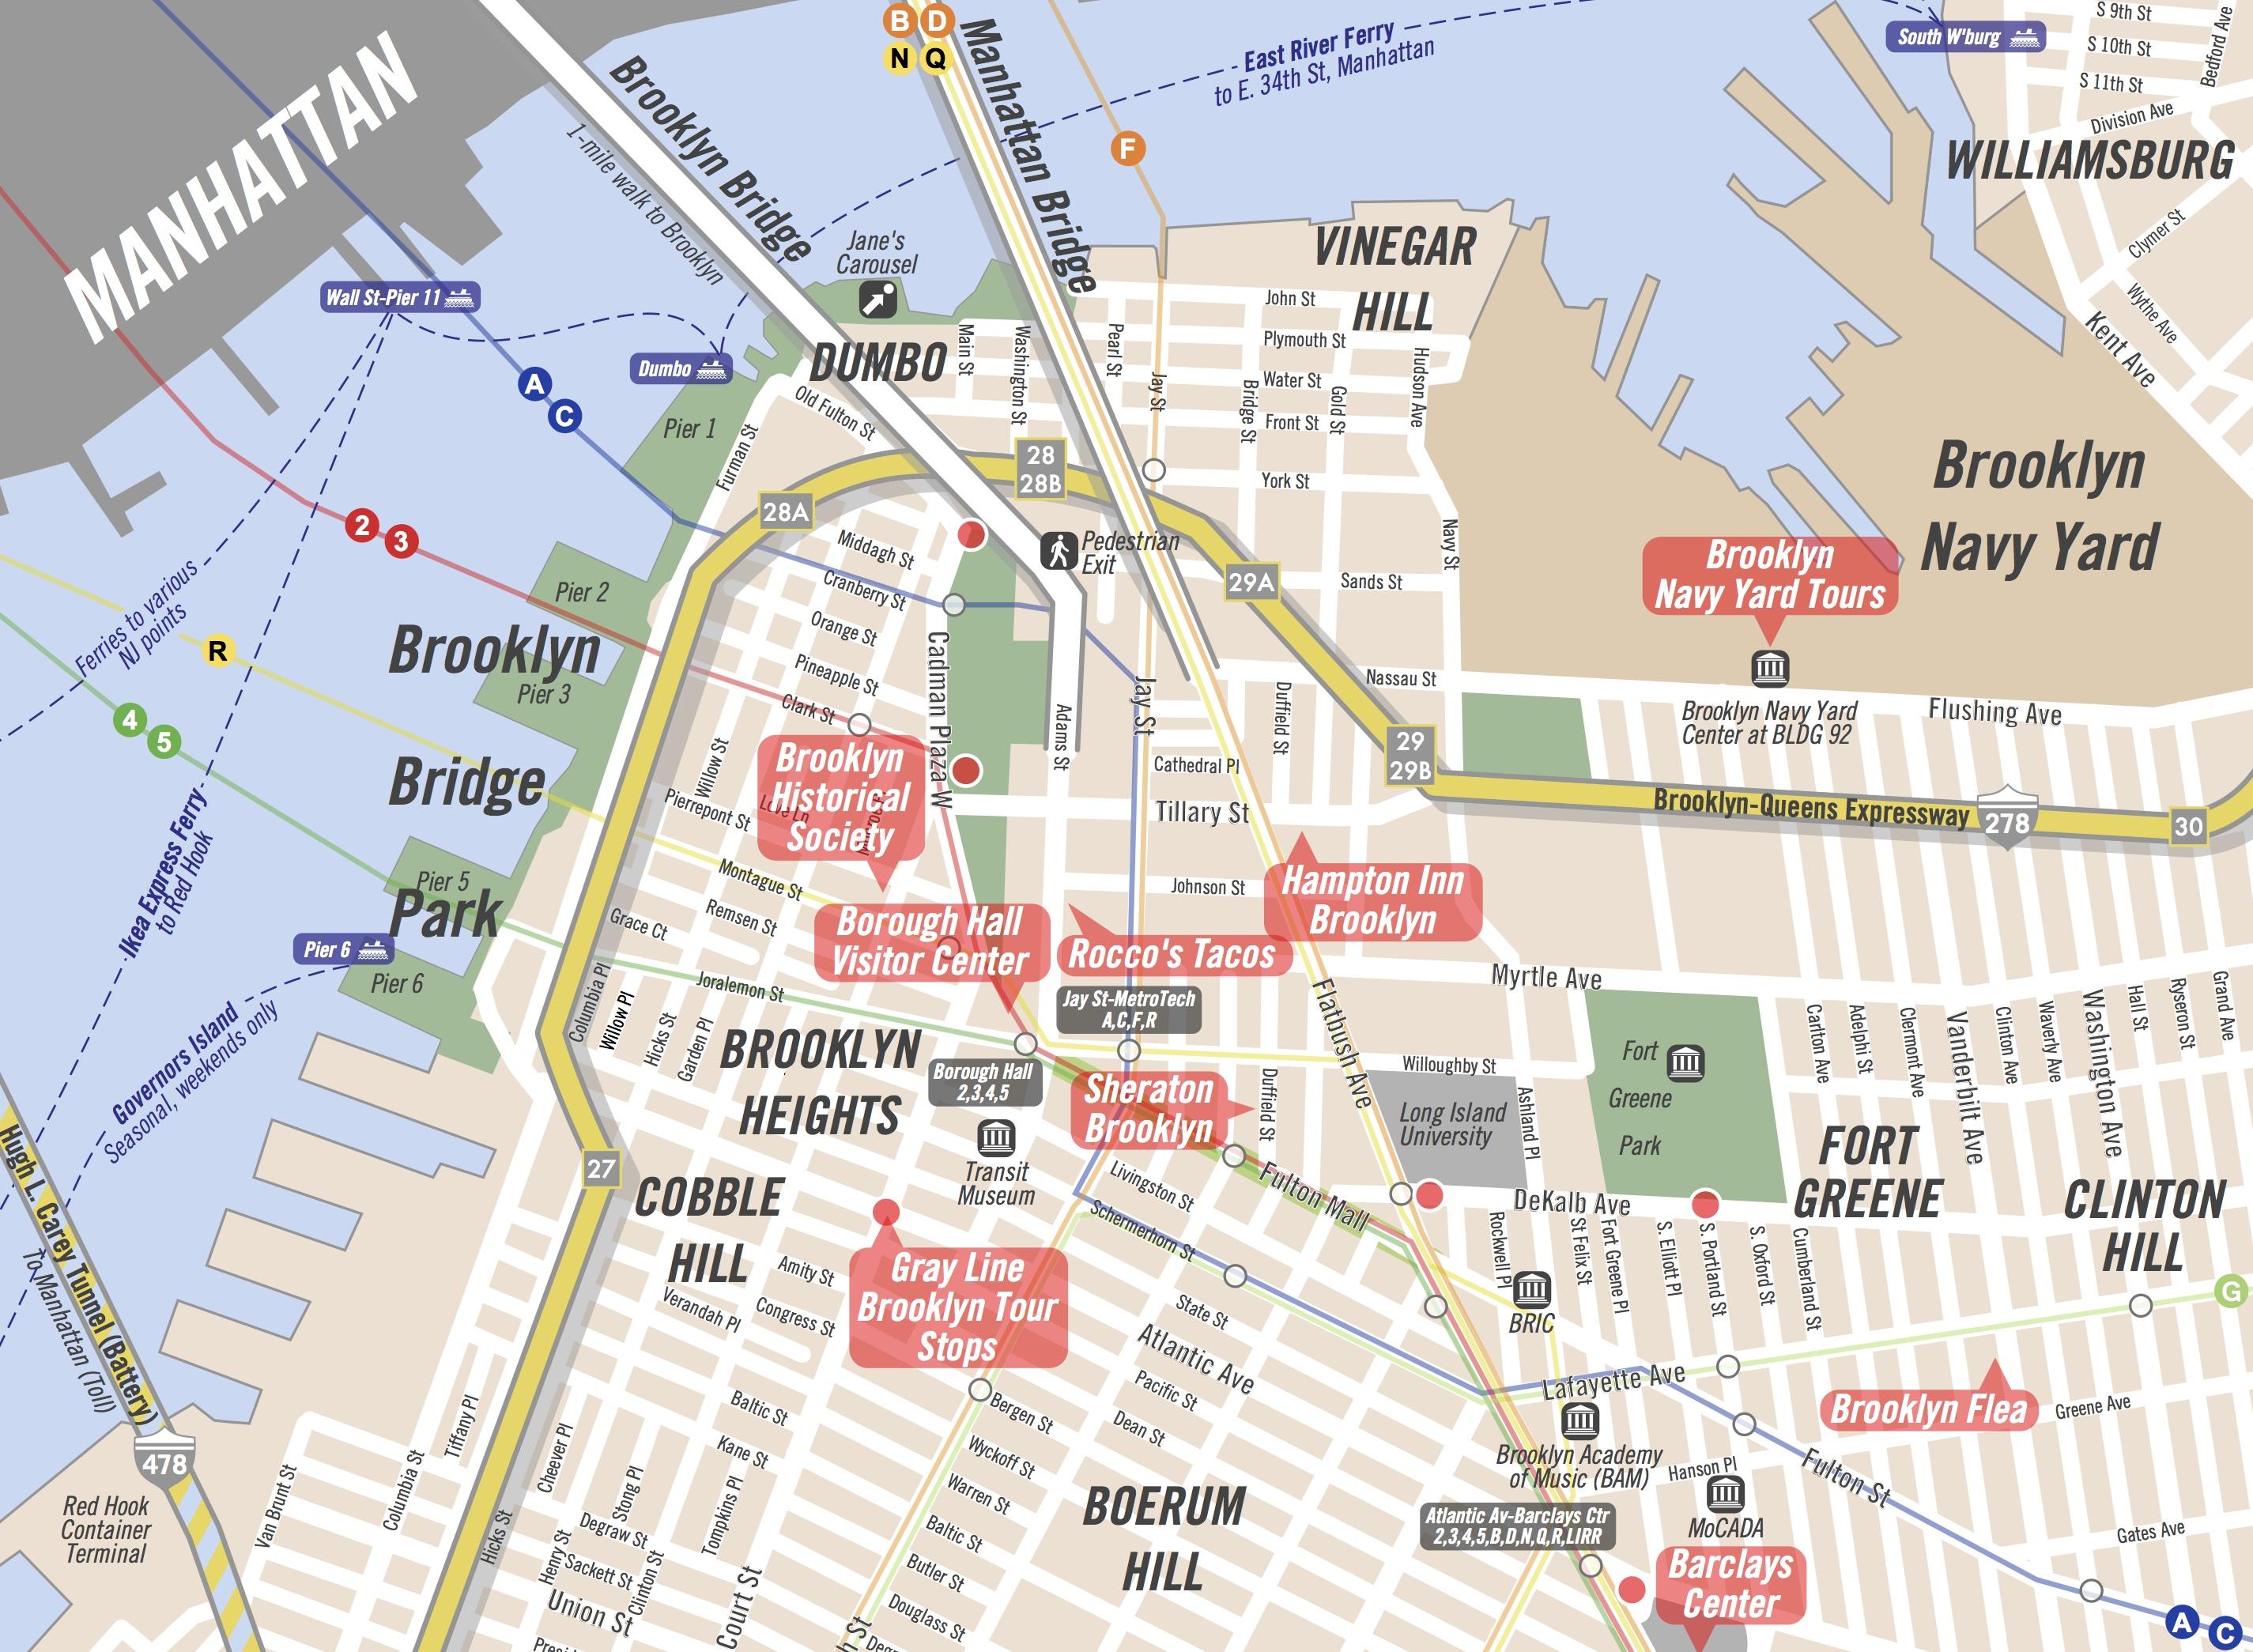 new york tourist guide book free